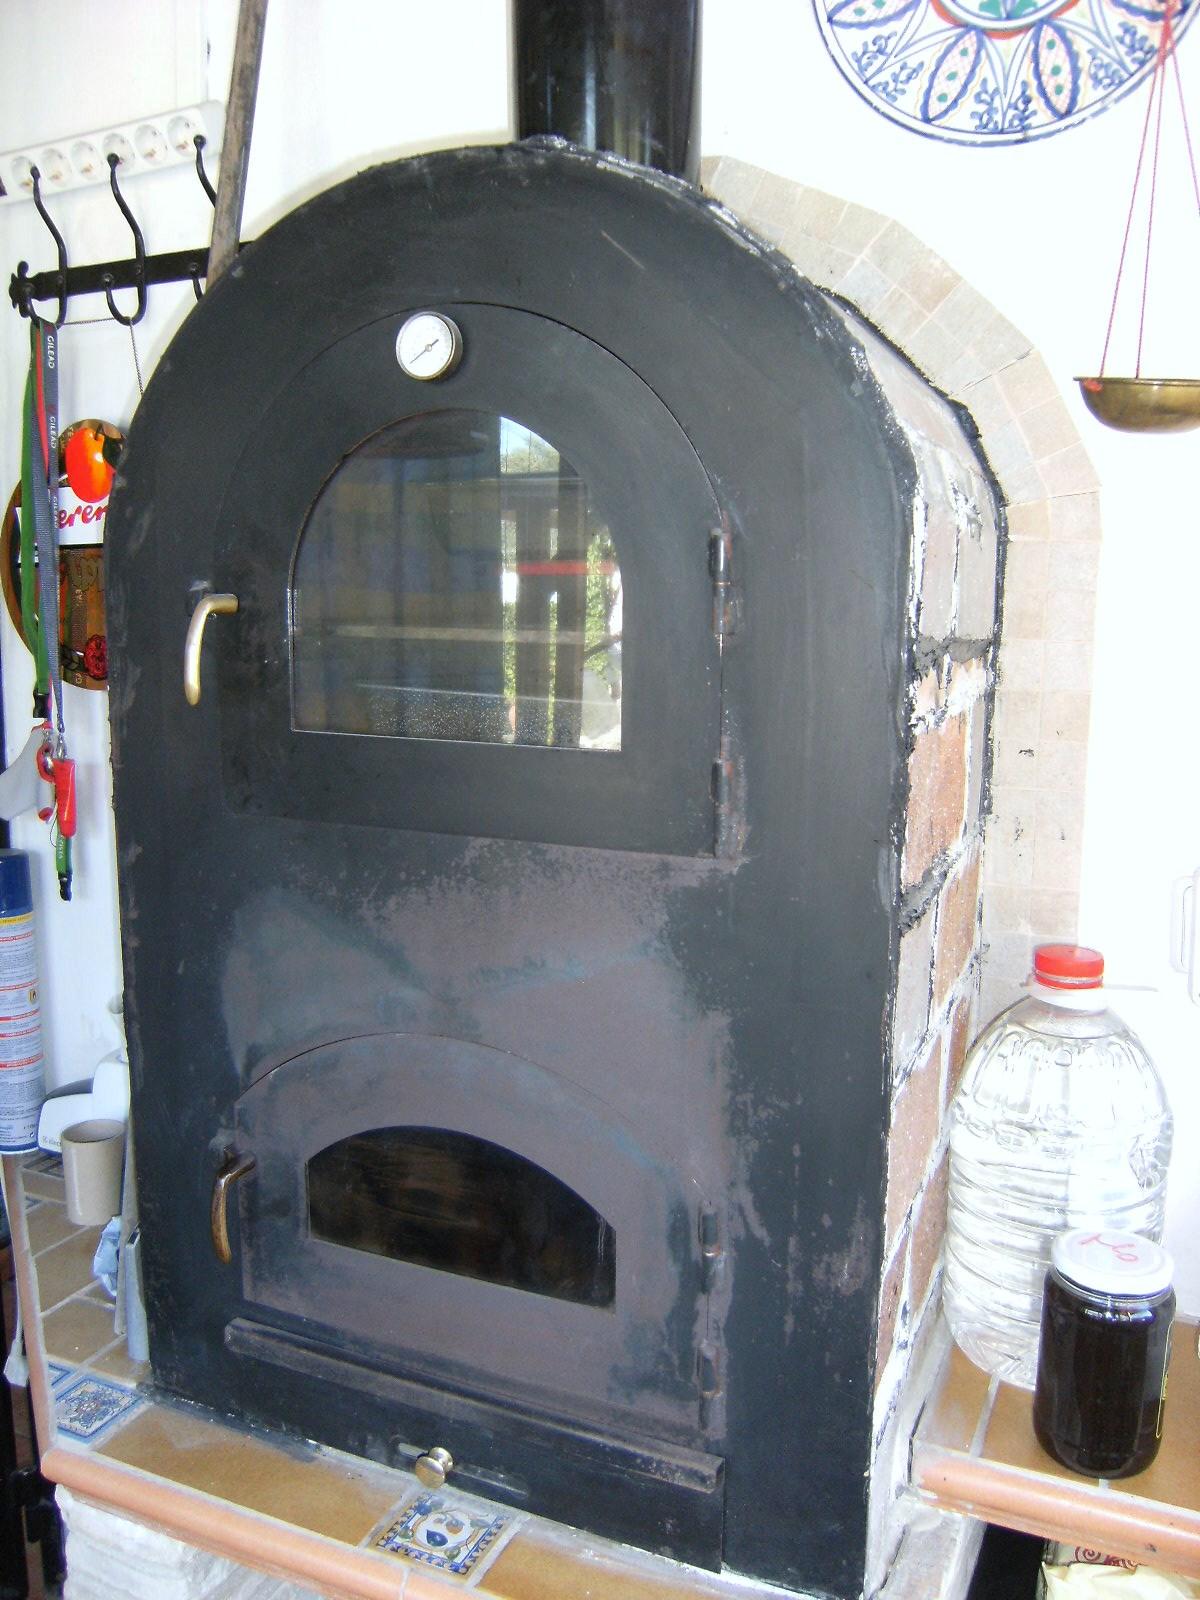 Energia solar casera y utiles c mo usar un horno de le a para calentar una habitaci n - Horno casero de lena ...